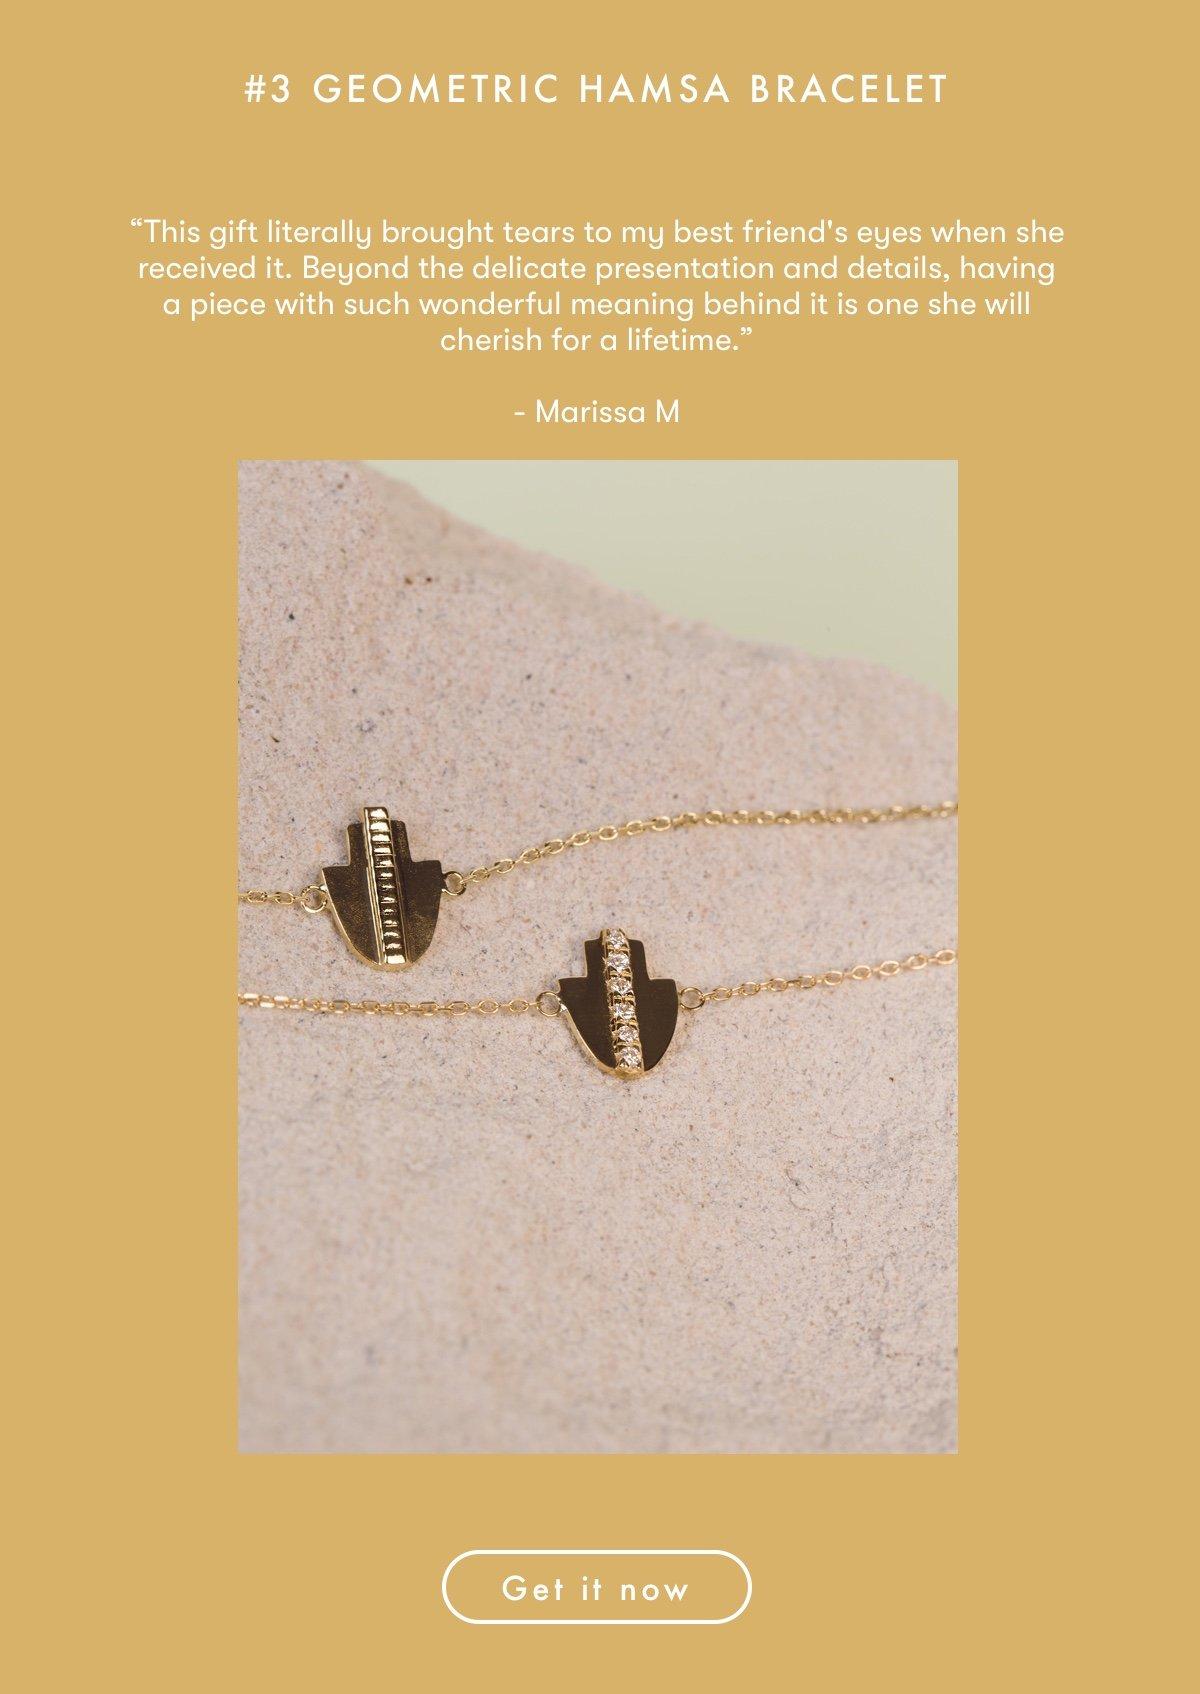 Geometric Hamsa Bracelet